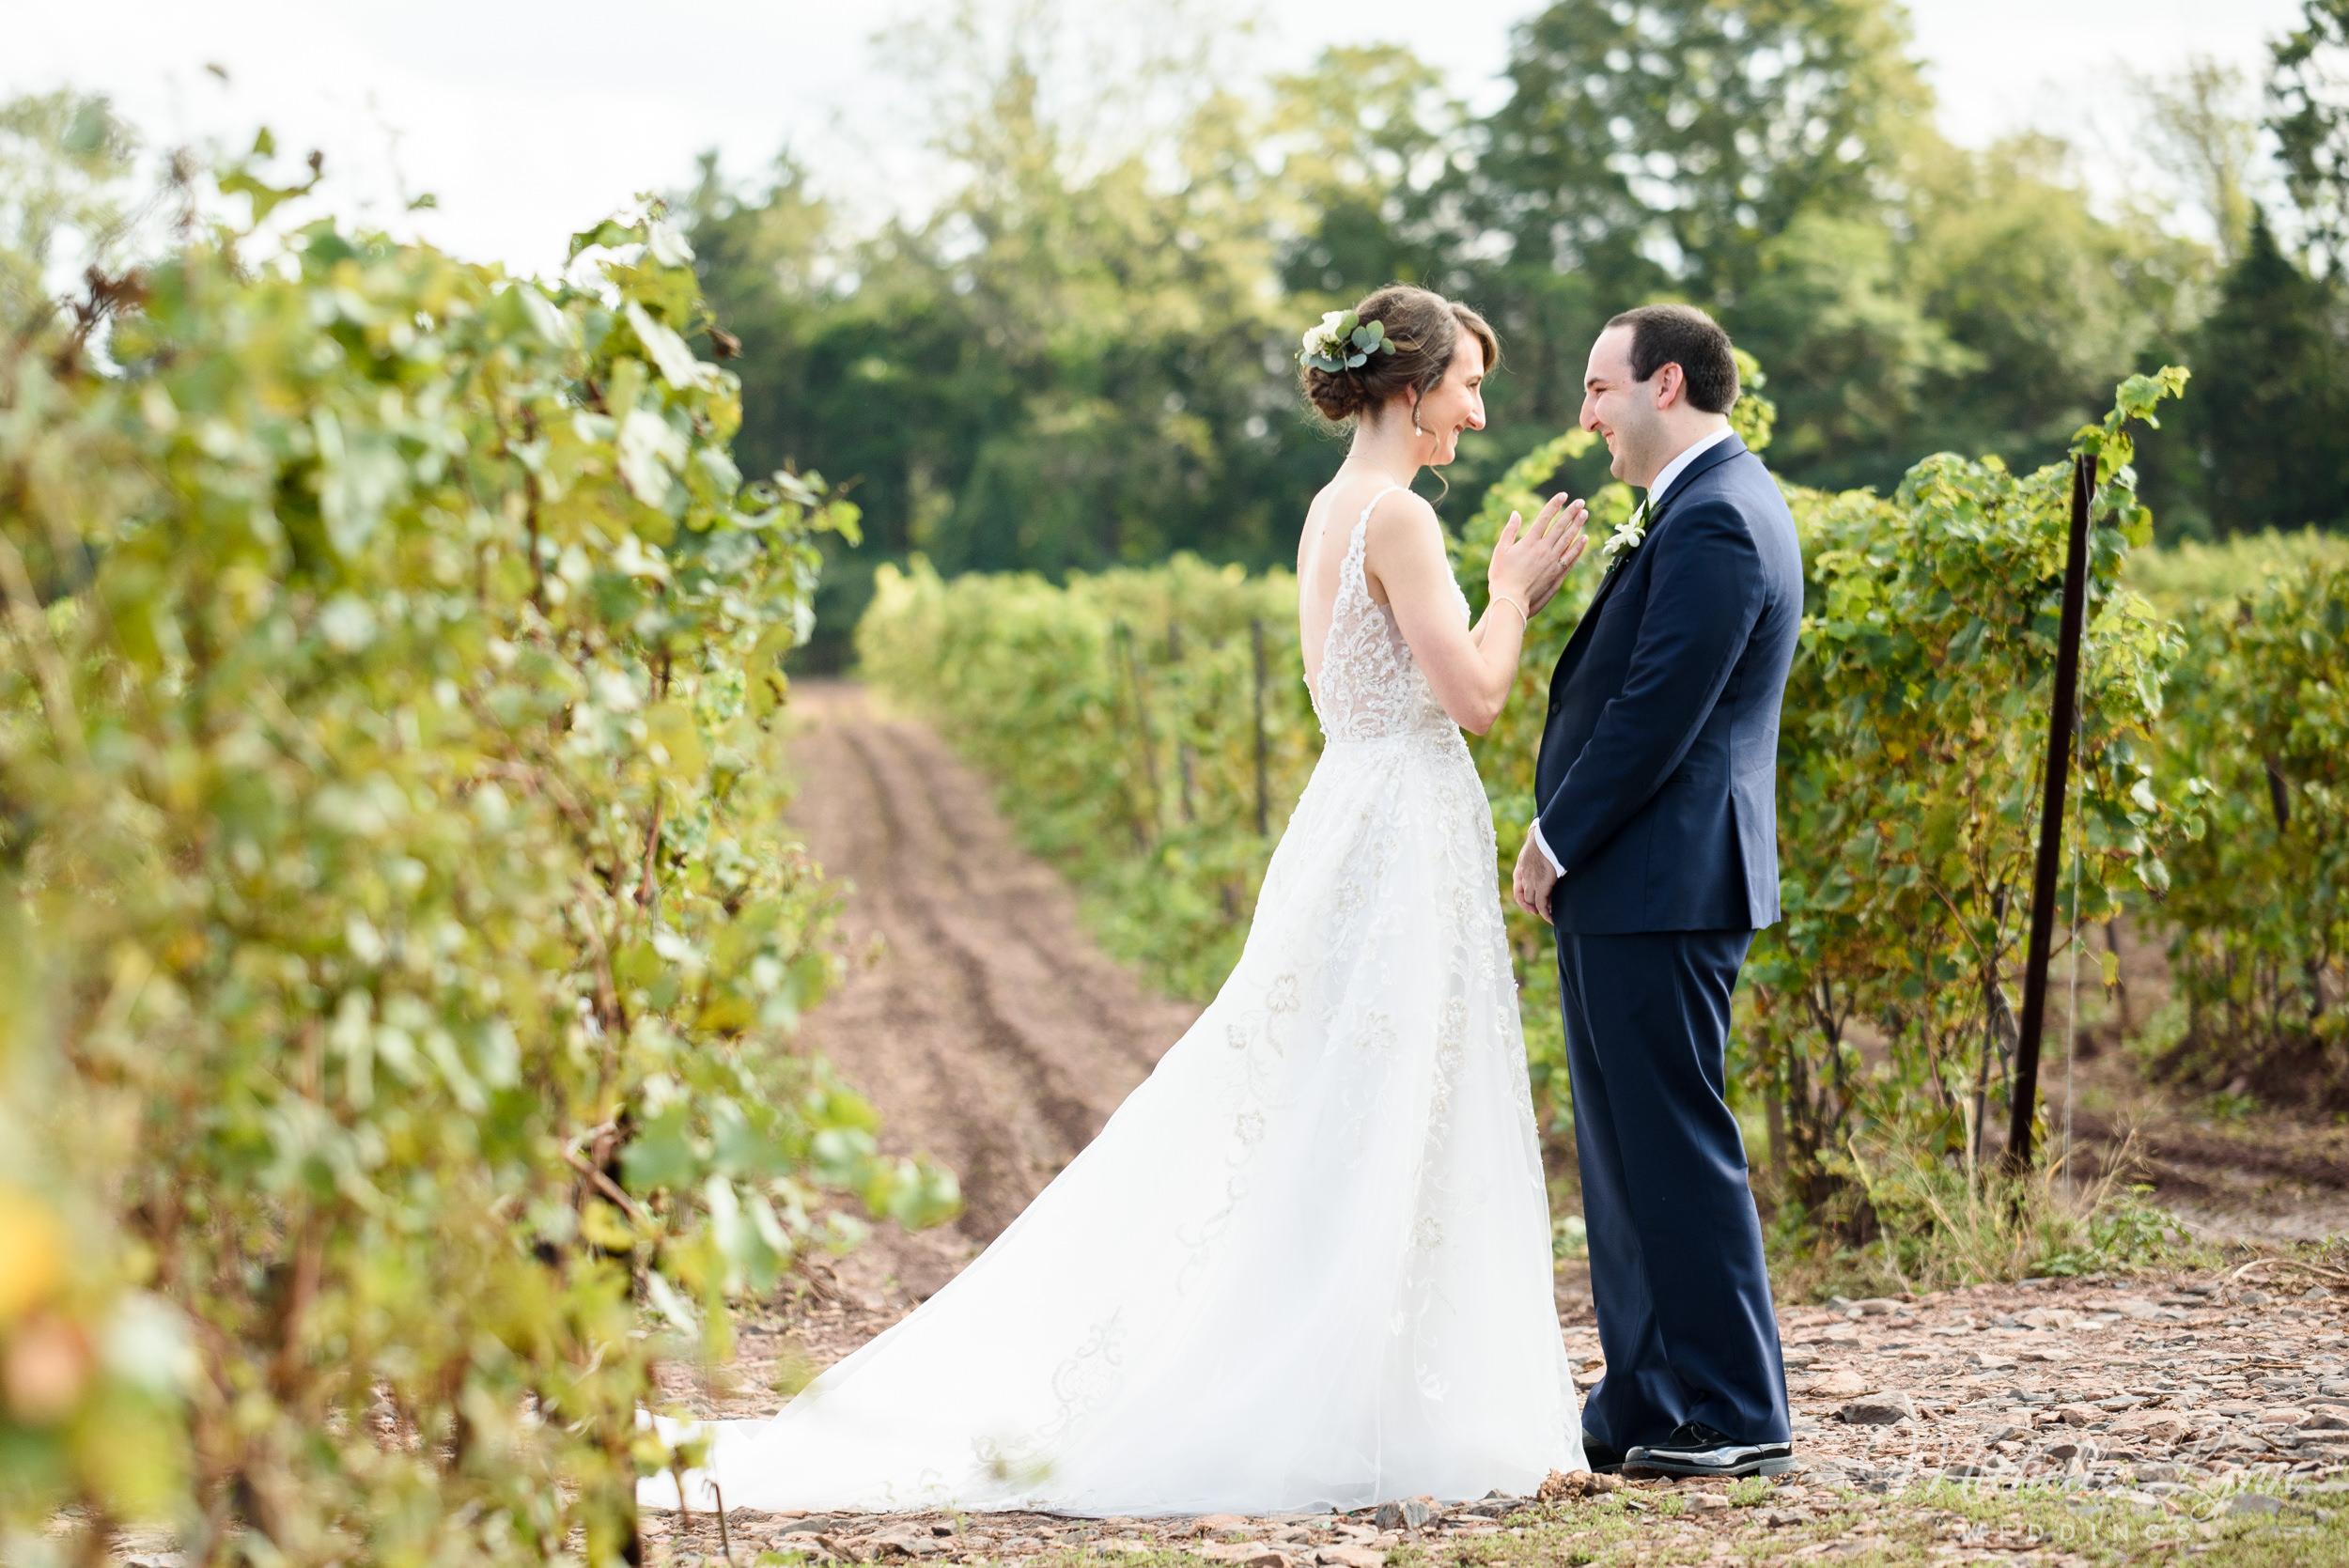 sand-castle-winery-pennsylvania-wedding-photography-33.jpg